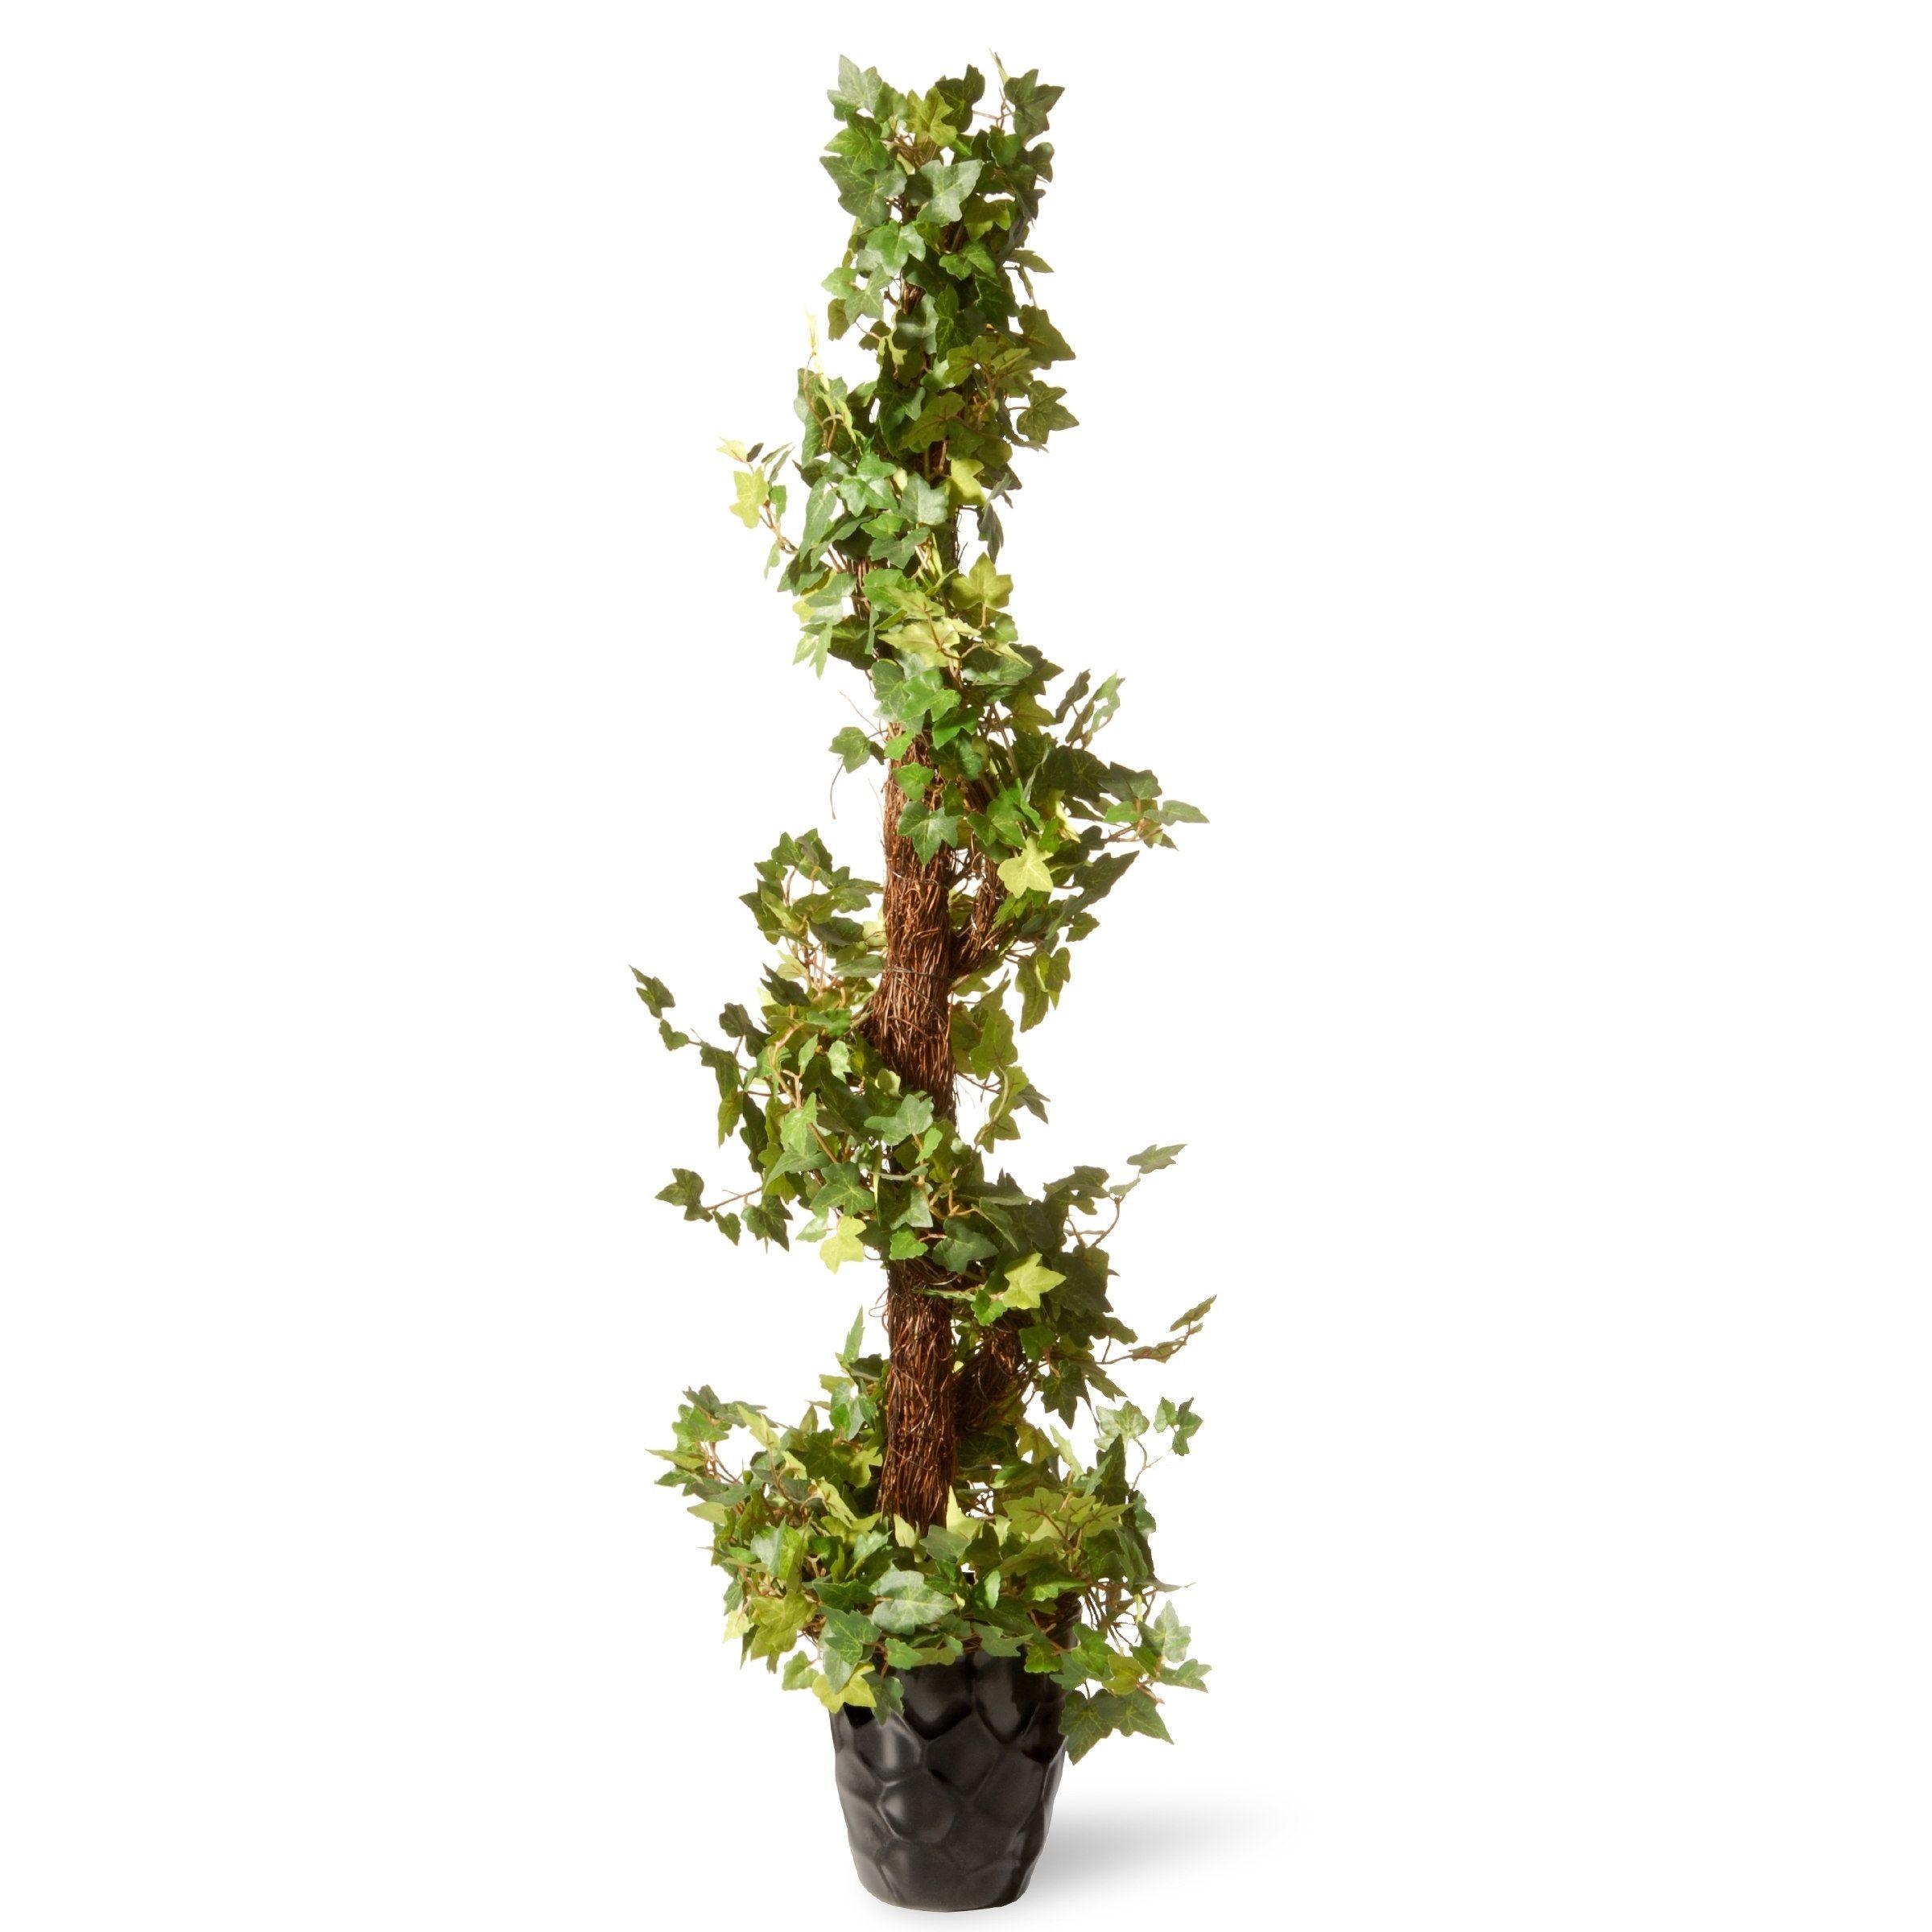 Decorative Natural Looking Artificial Faux Fake 3/' Cedar Spiral Silk Tree Plants